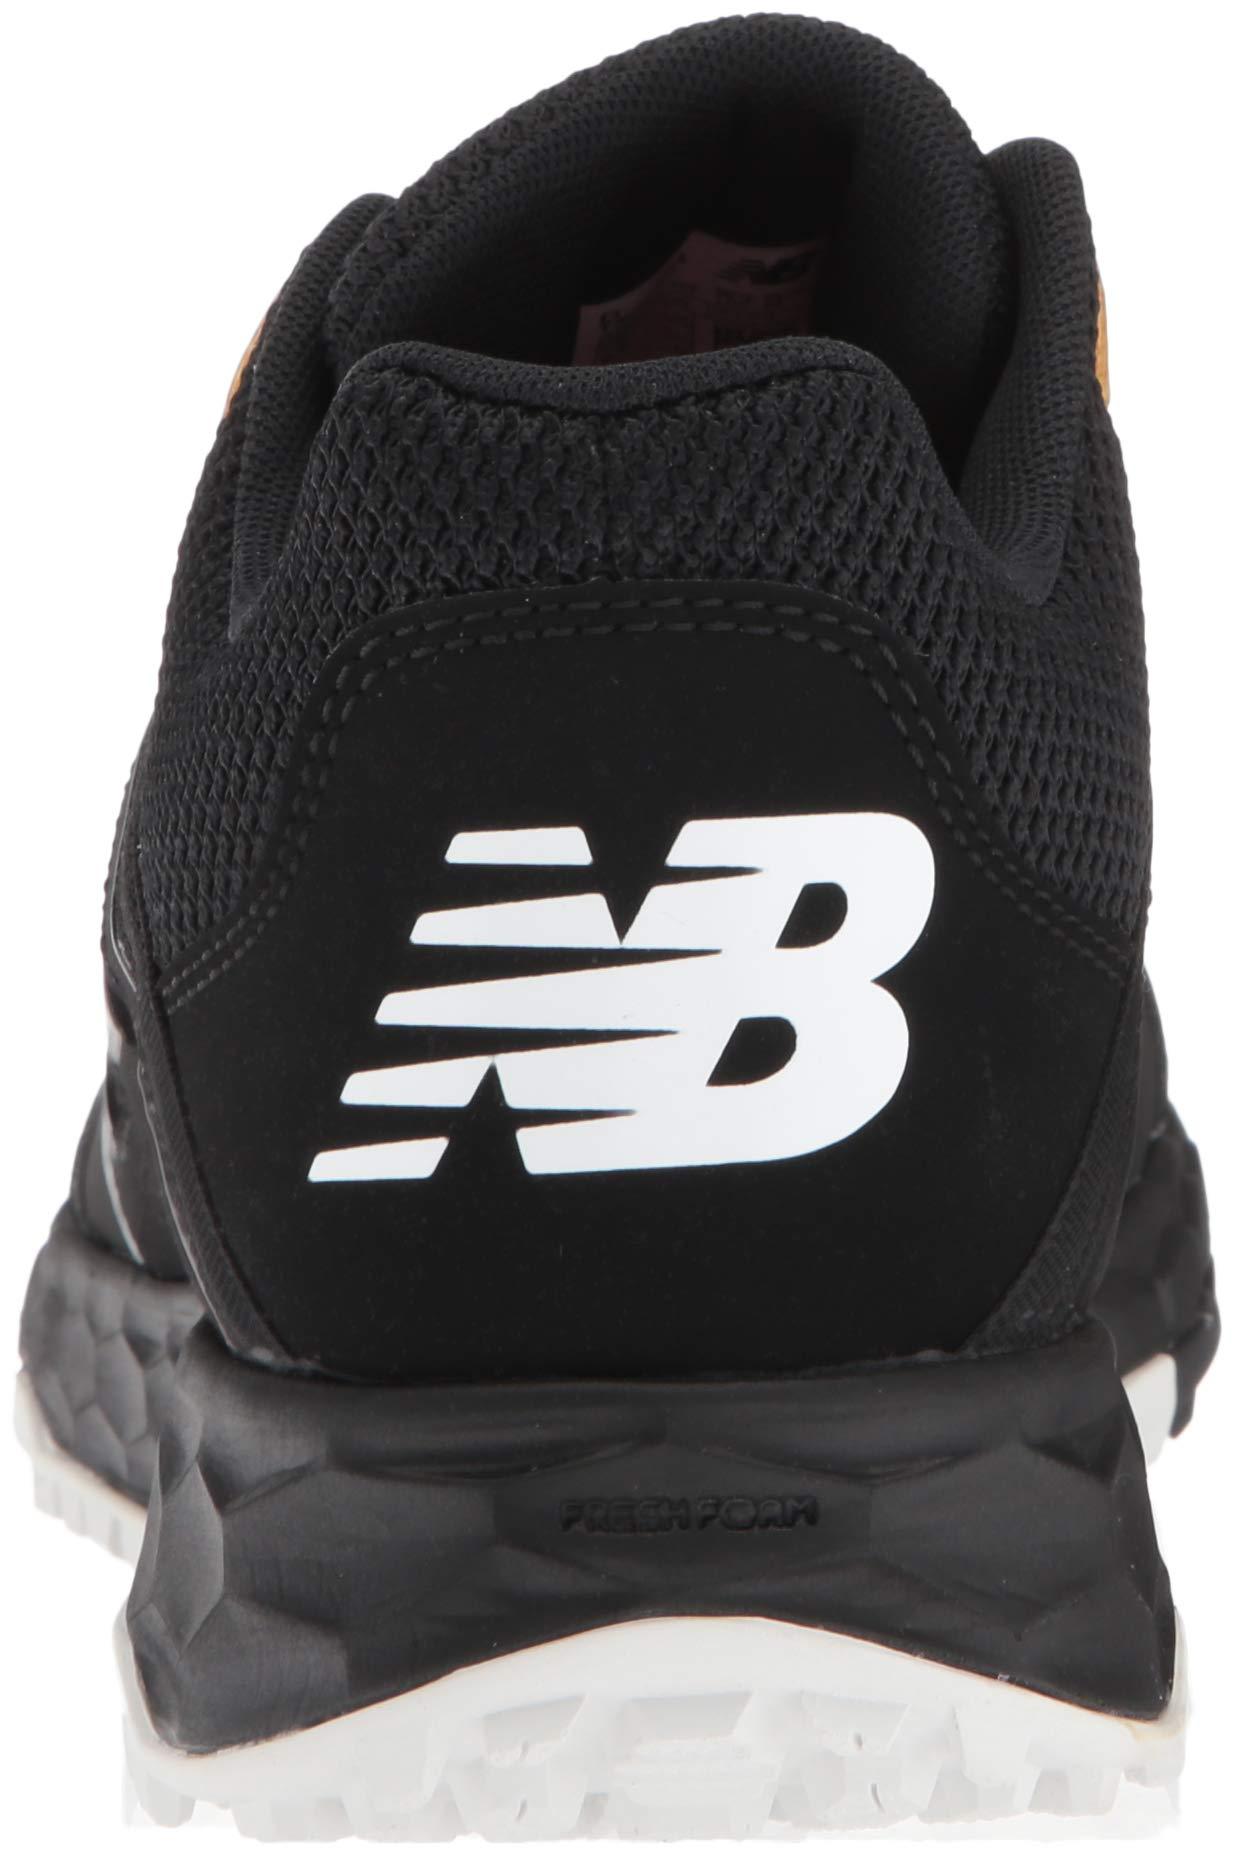 New Balance Men's 3000v4 Turf Baseball Shoe, Black, 5 D US by New Balance (Image #2)